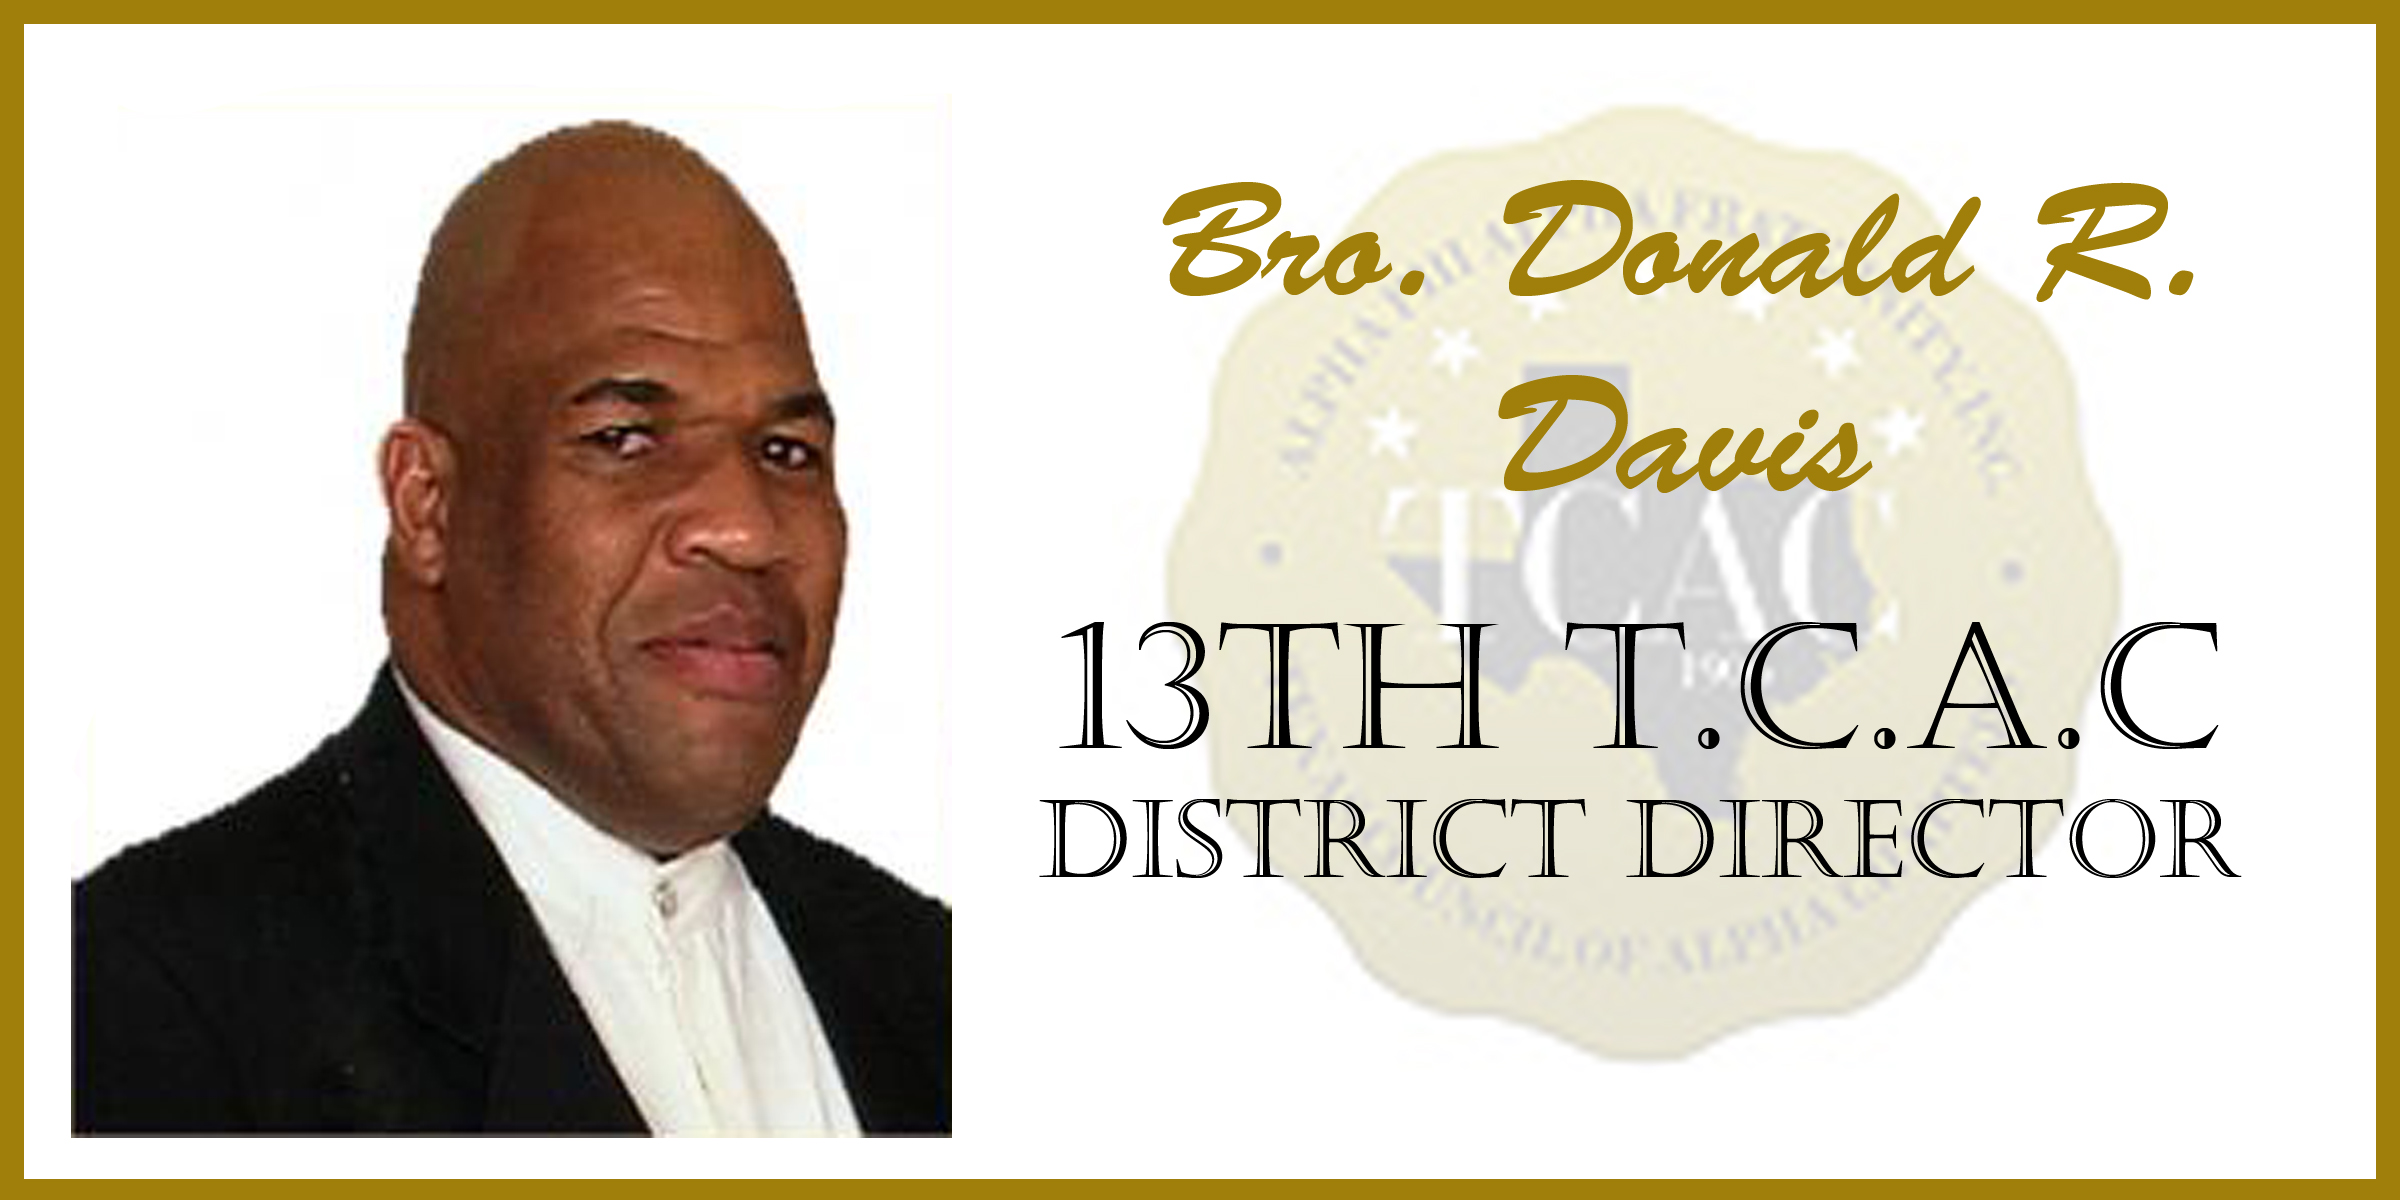 13 Bro Donald Davis